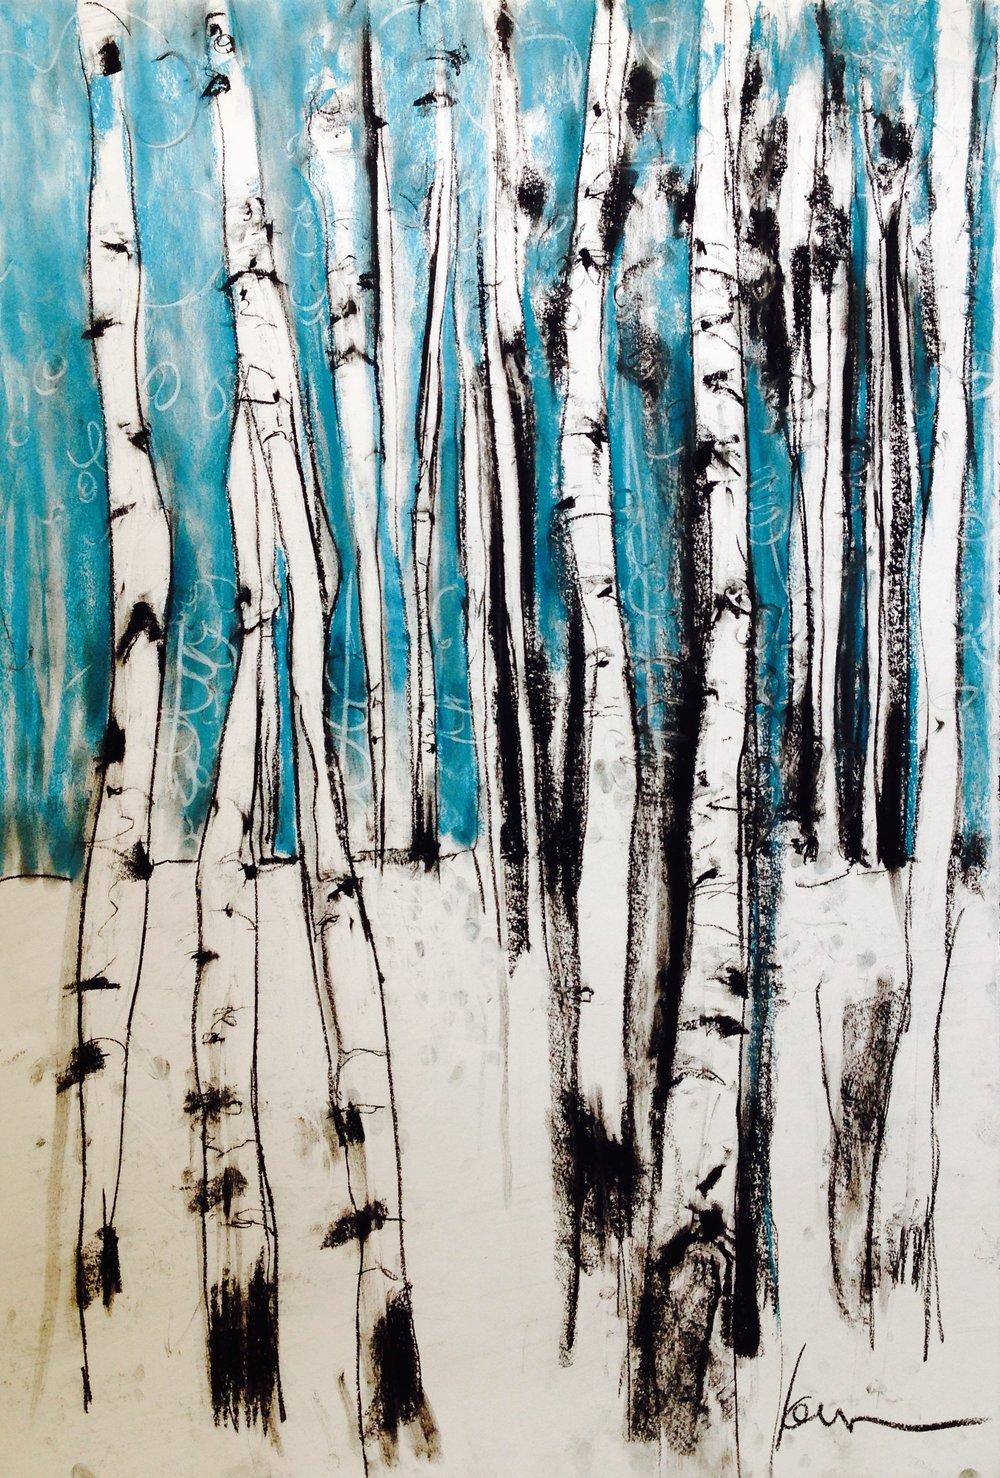 Turquoise Grove